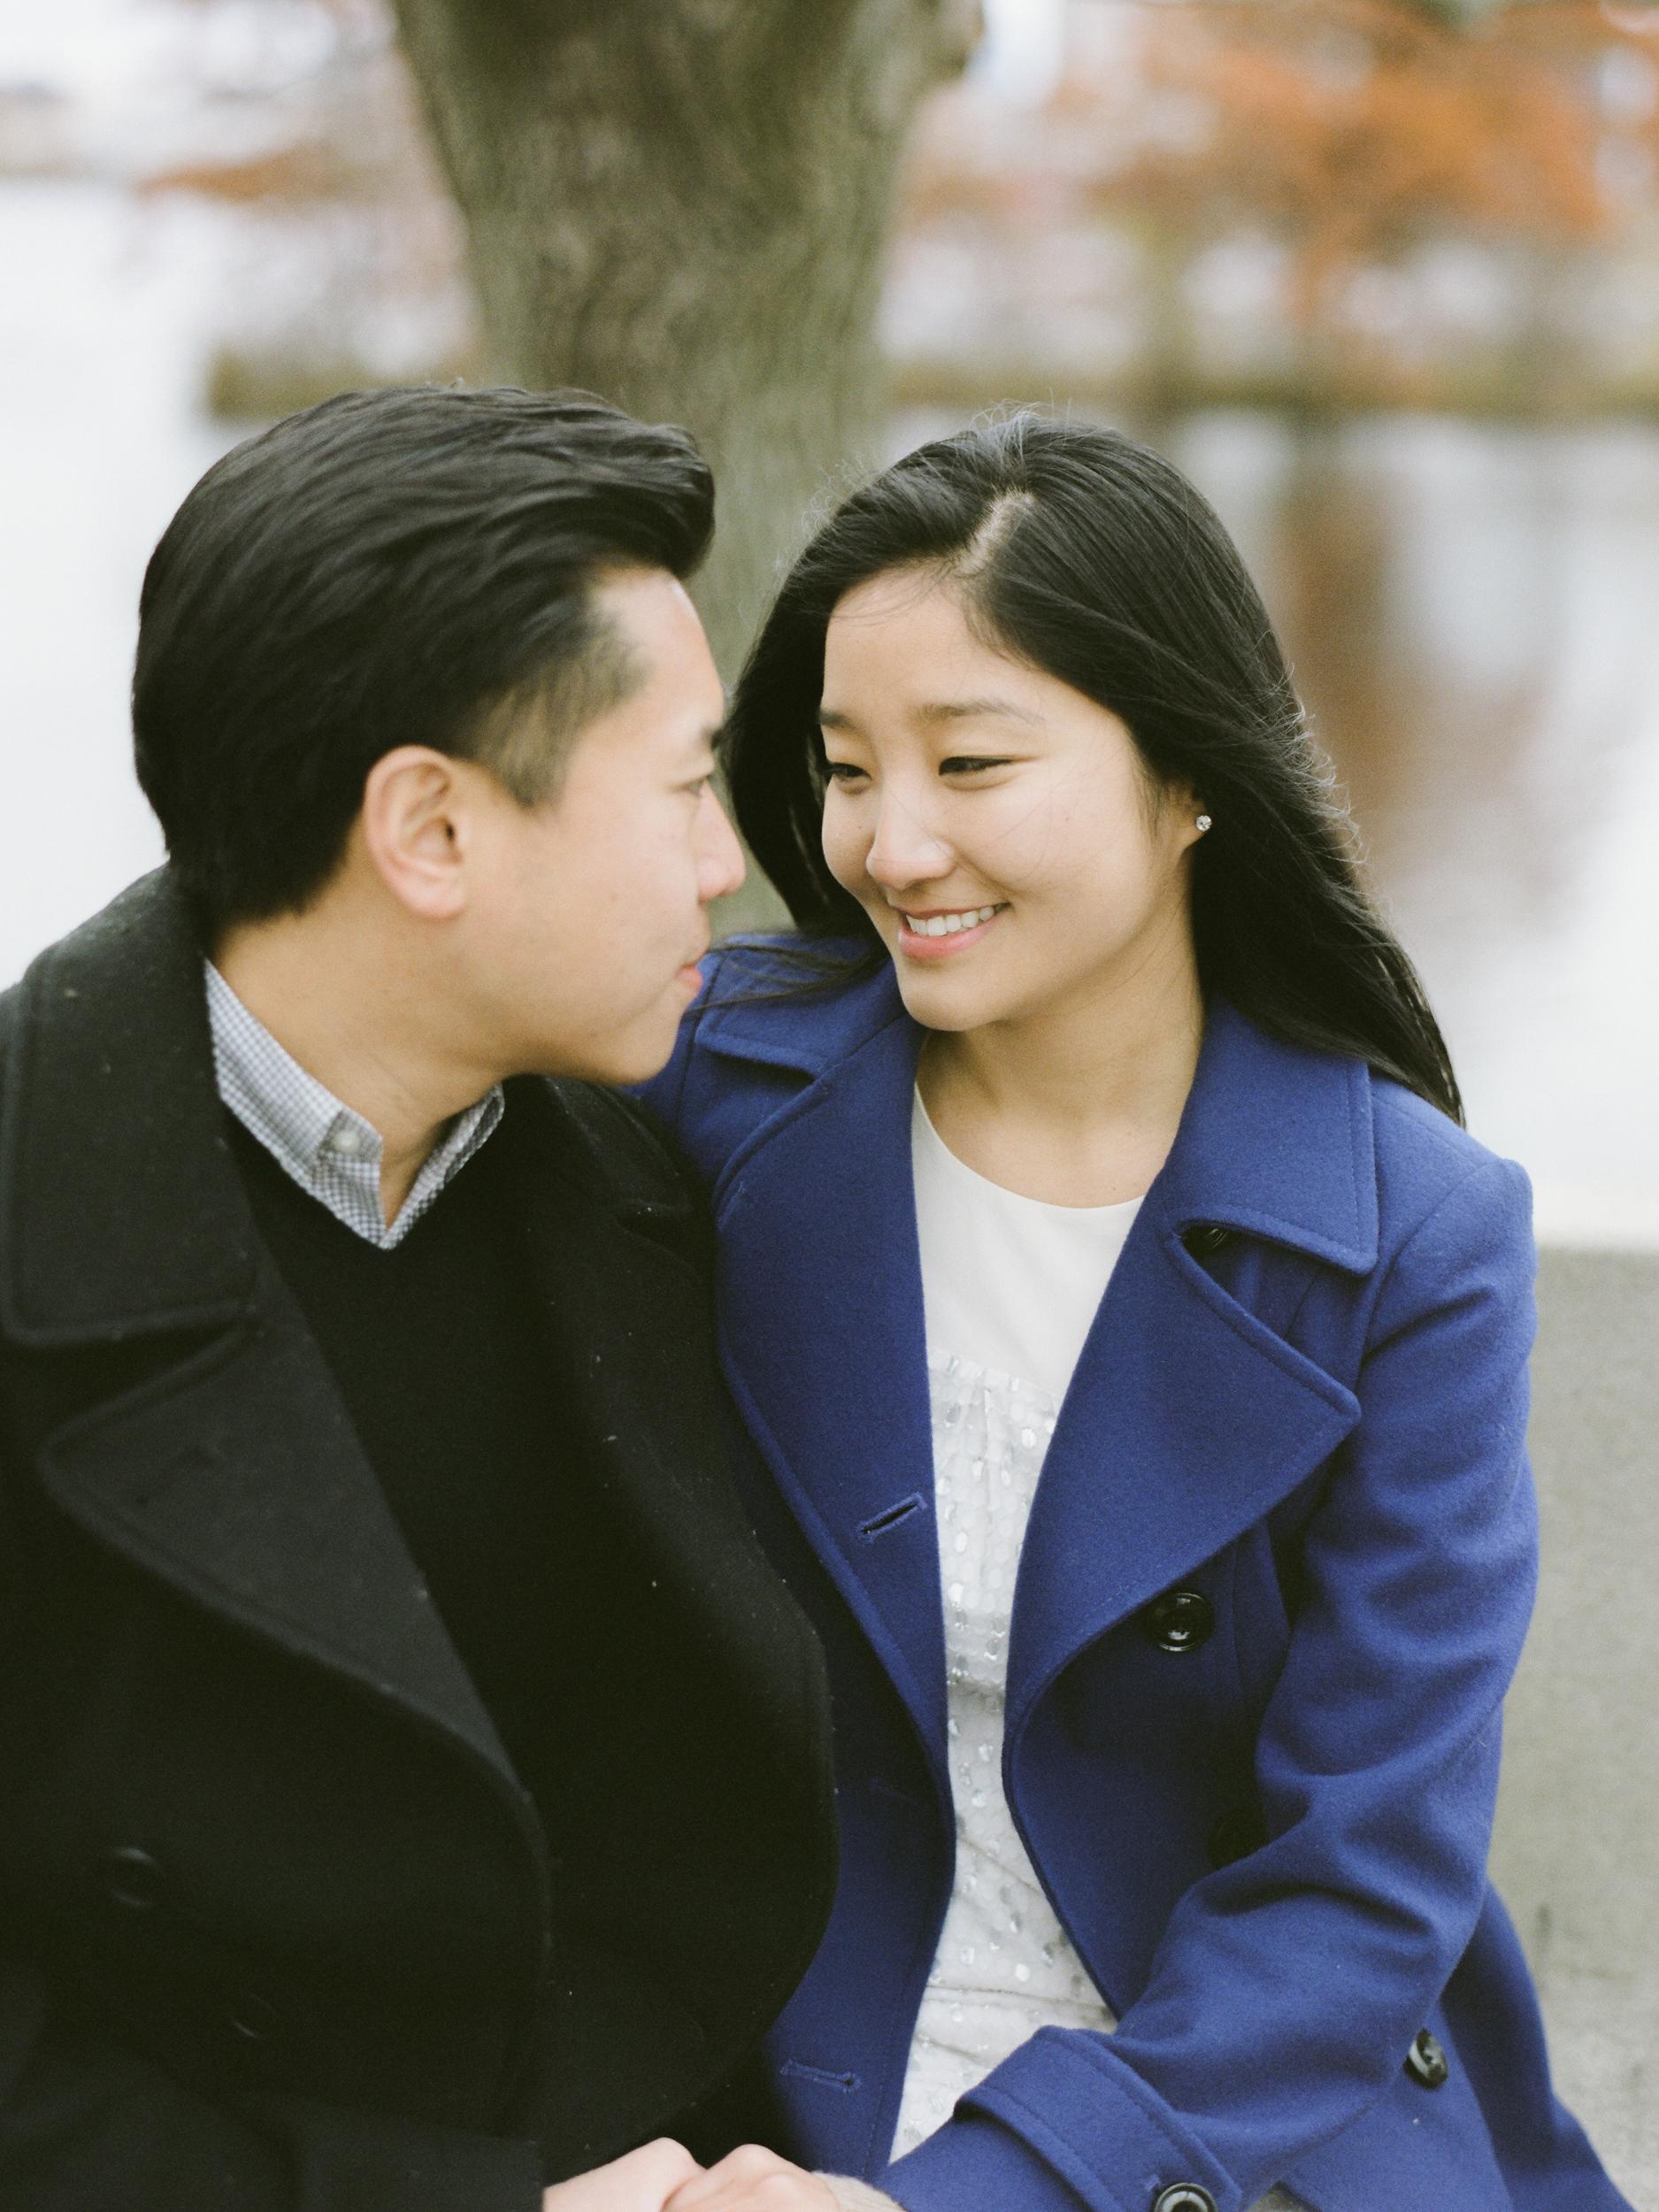 Wedding photographers near Boston